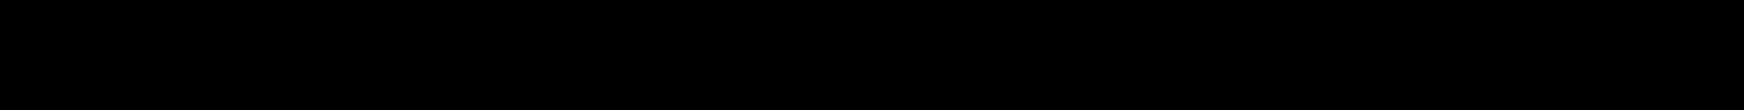 katsoulidis-regular-webfont.ttf